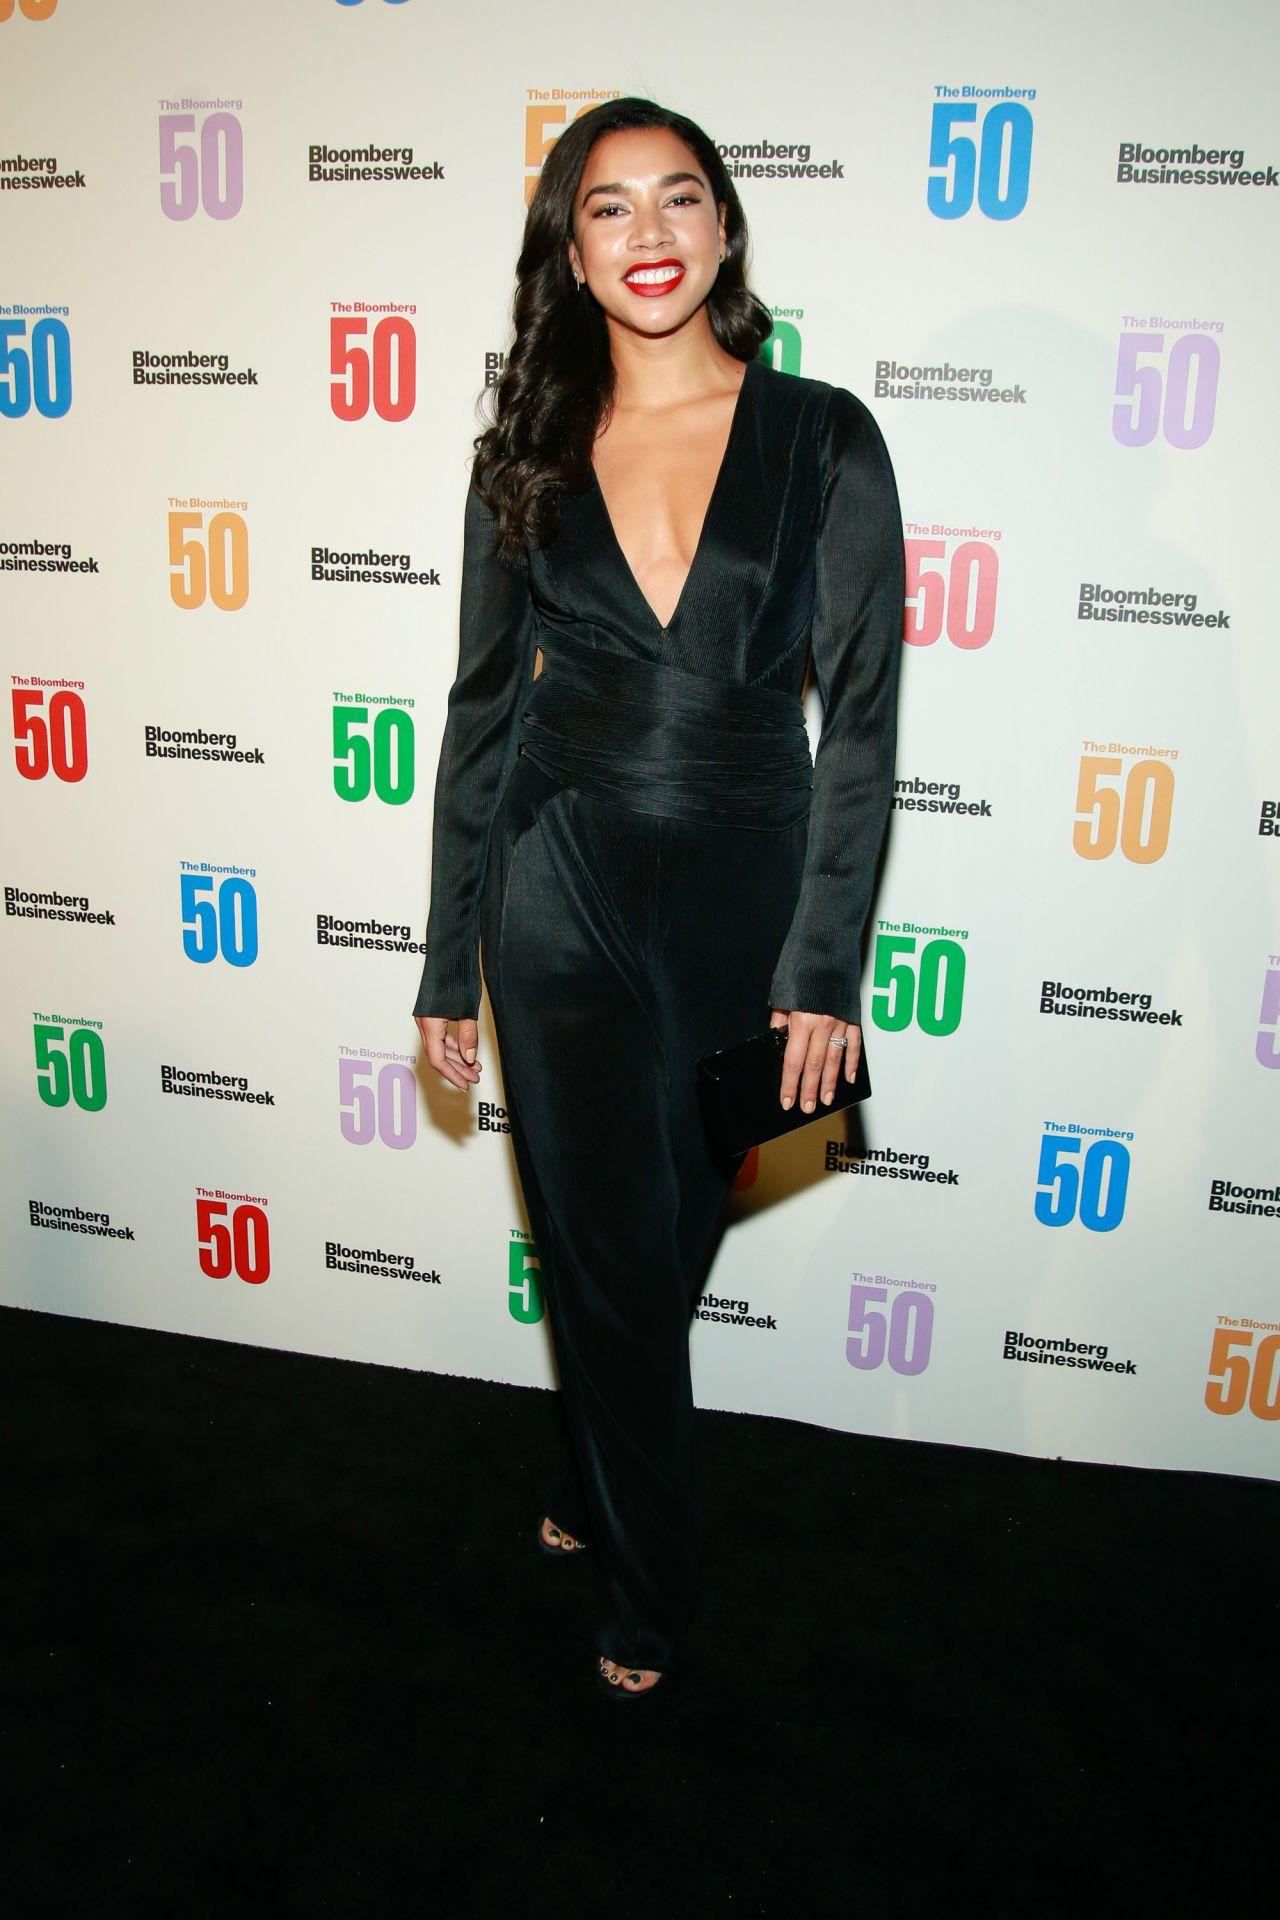 Hannah Bronfman Bloomberg 50 Awards In New York City